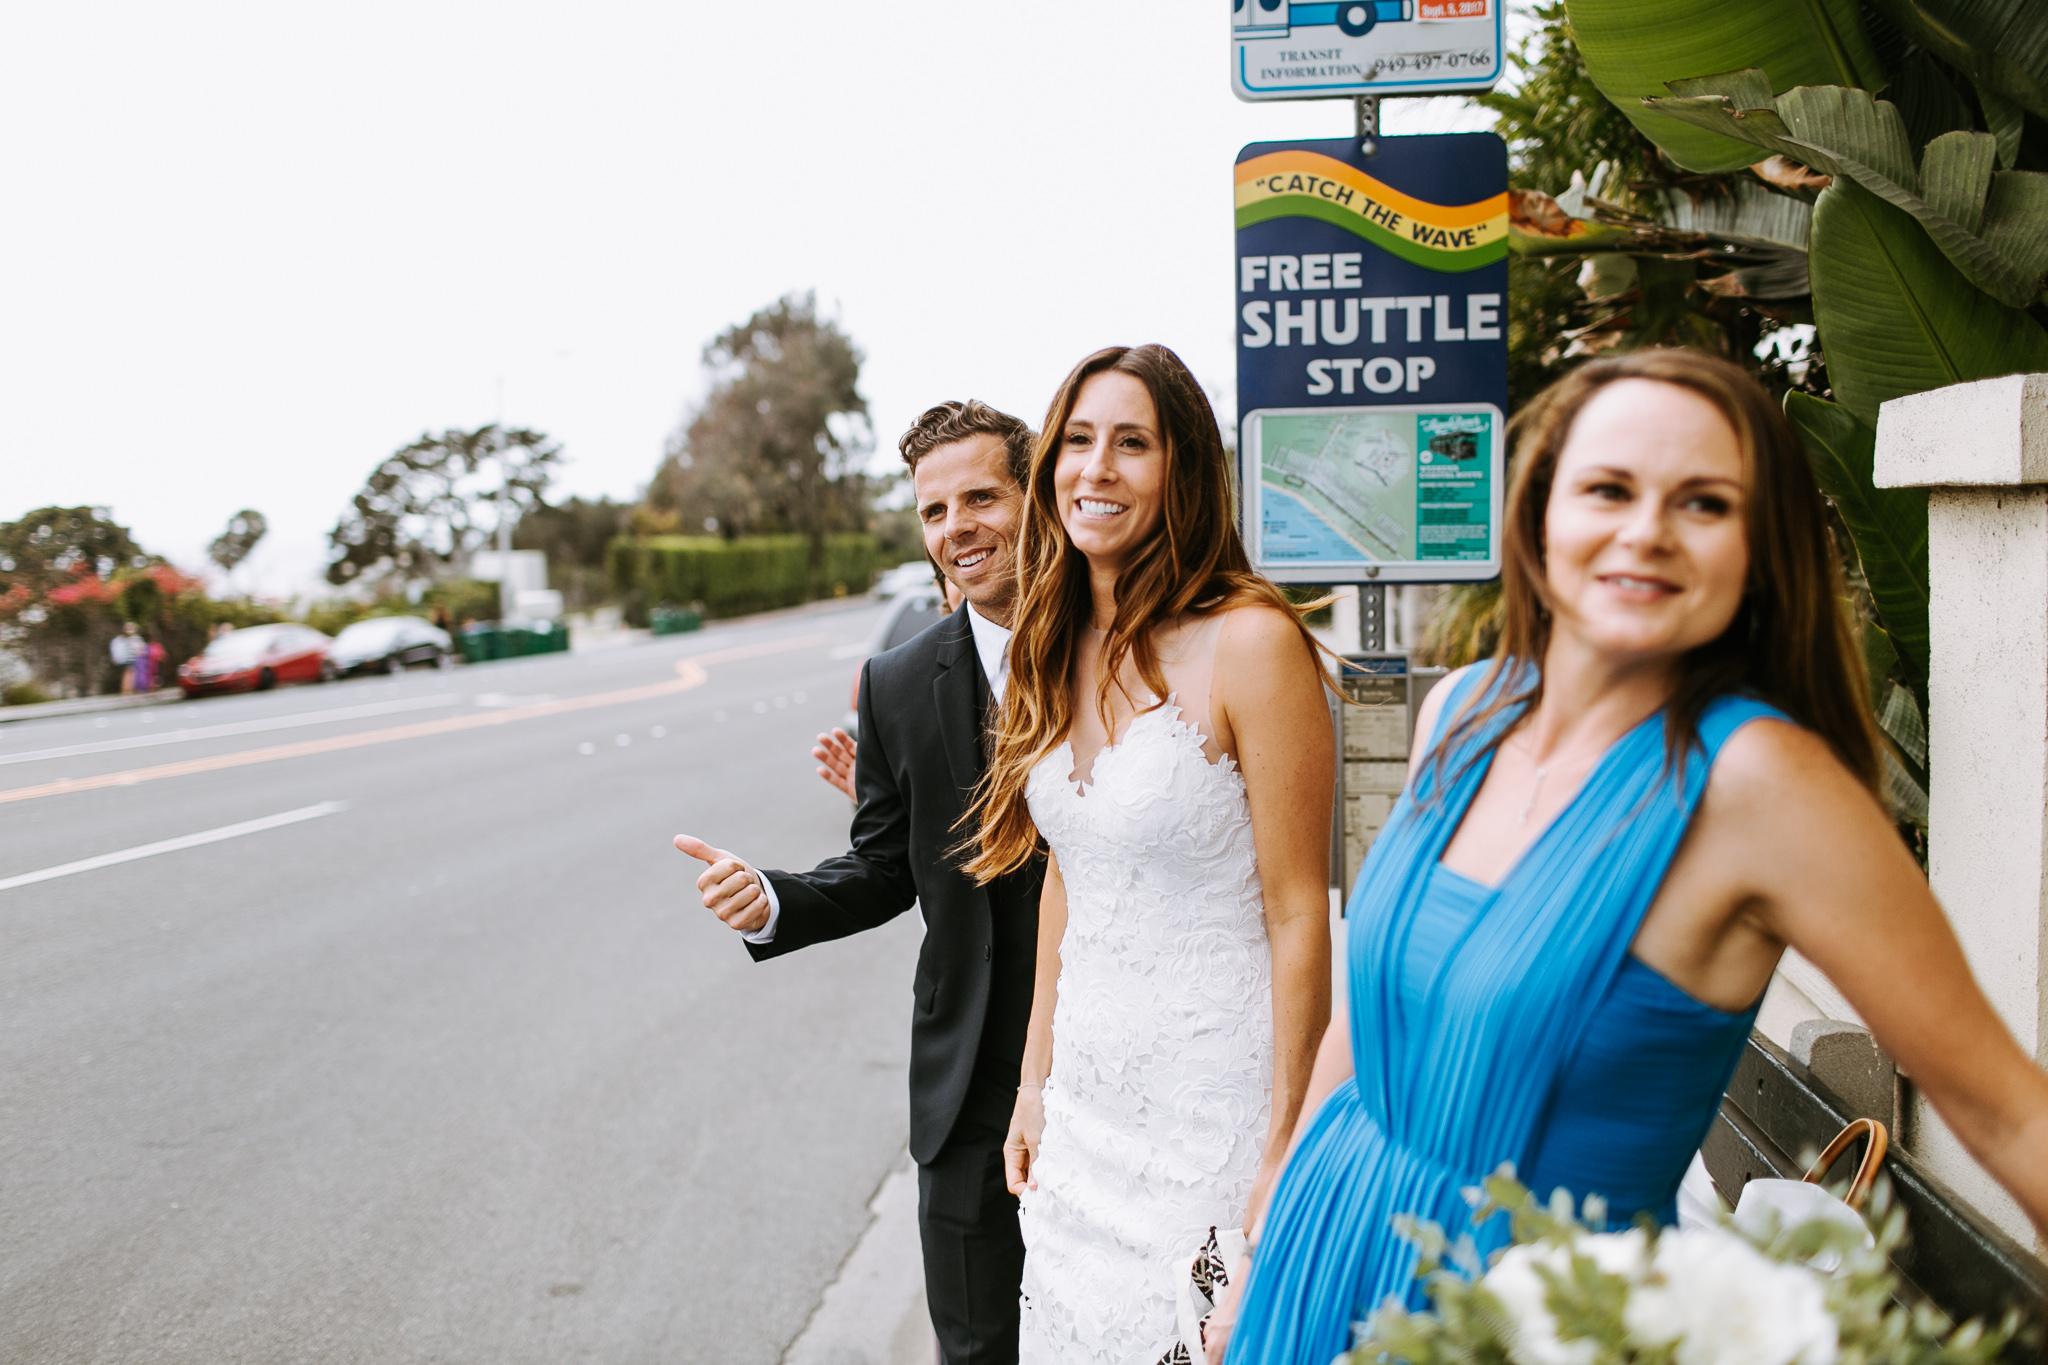 LagunaBeach-WeddingPhotographer-25.jpg